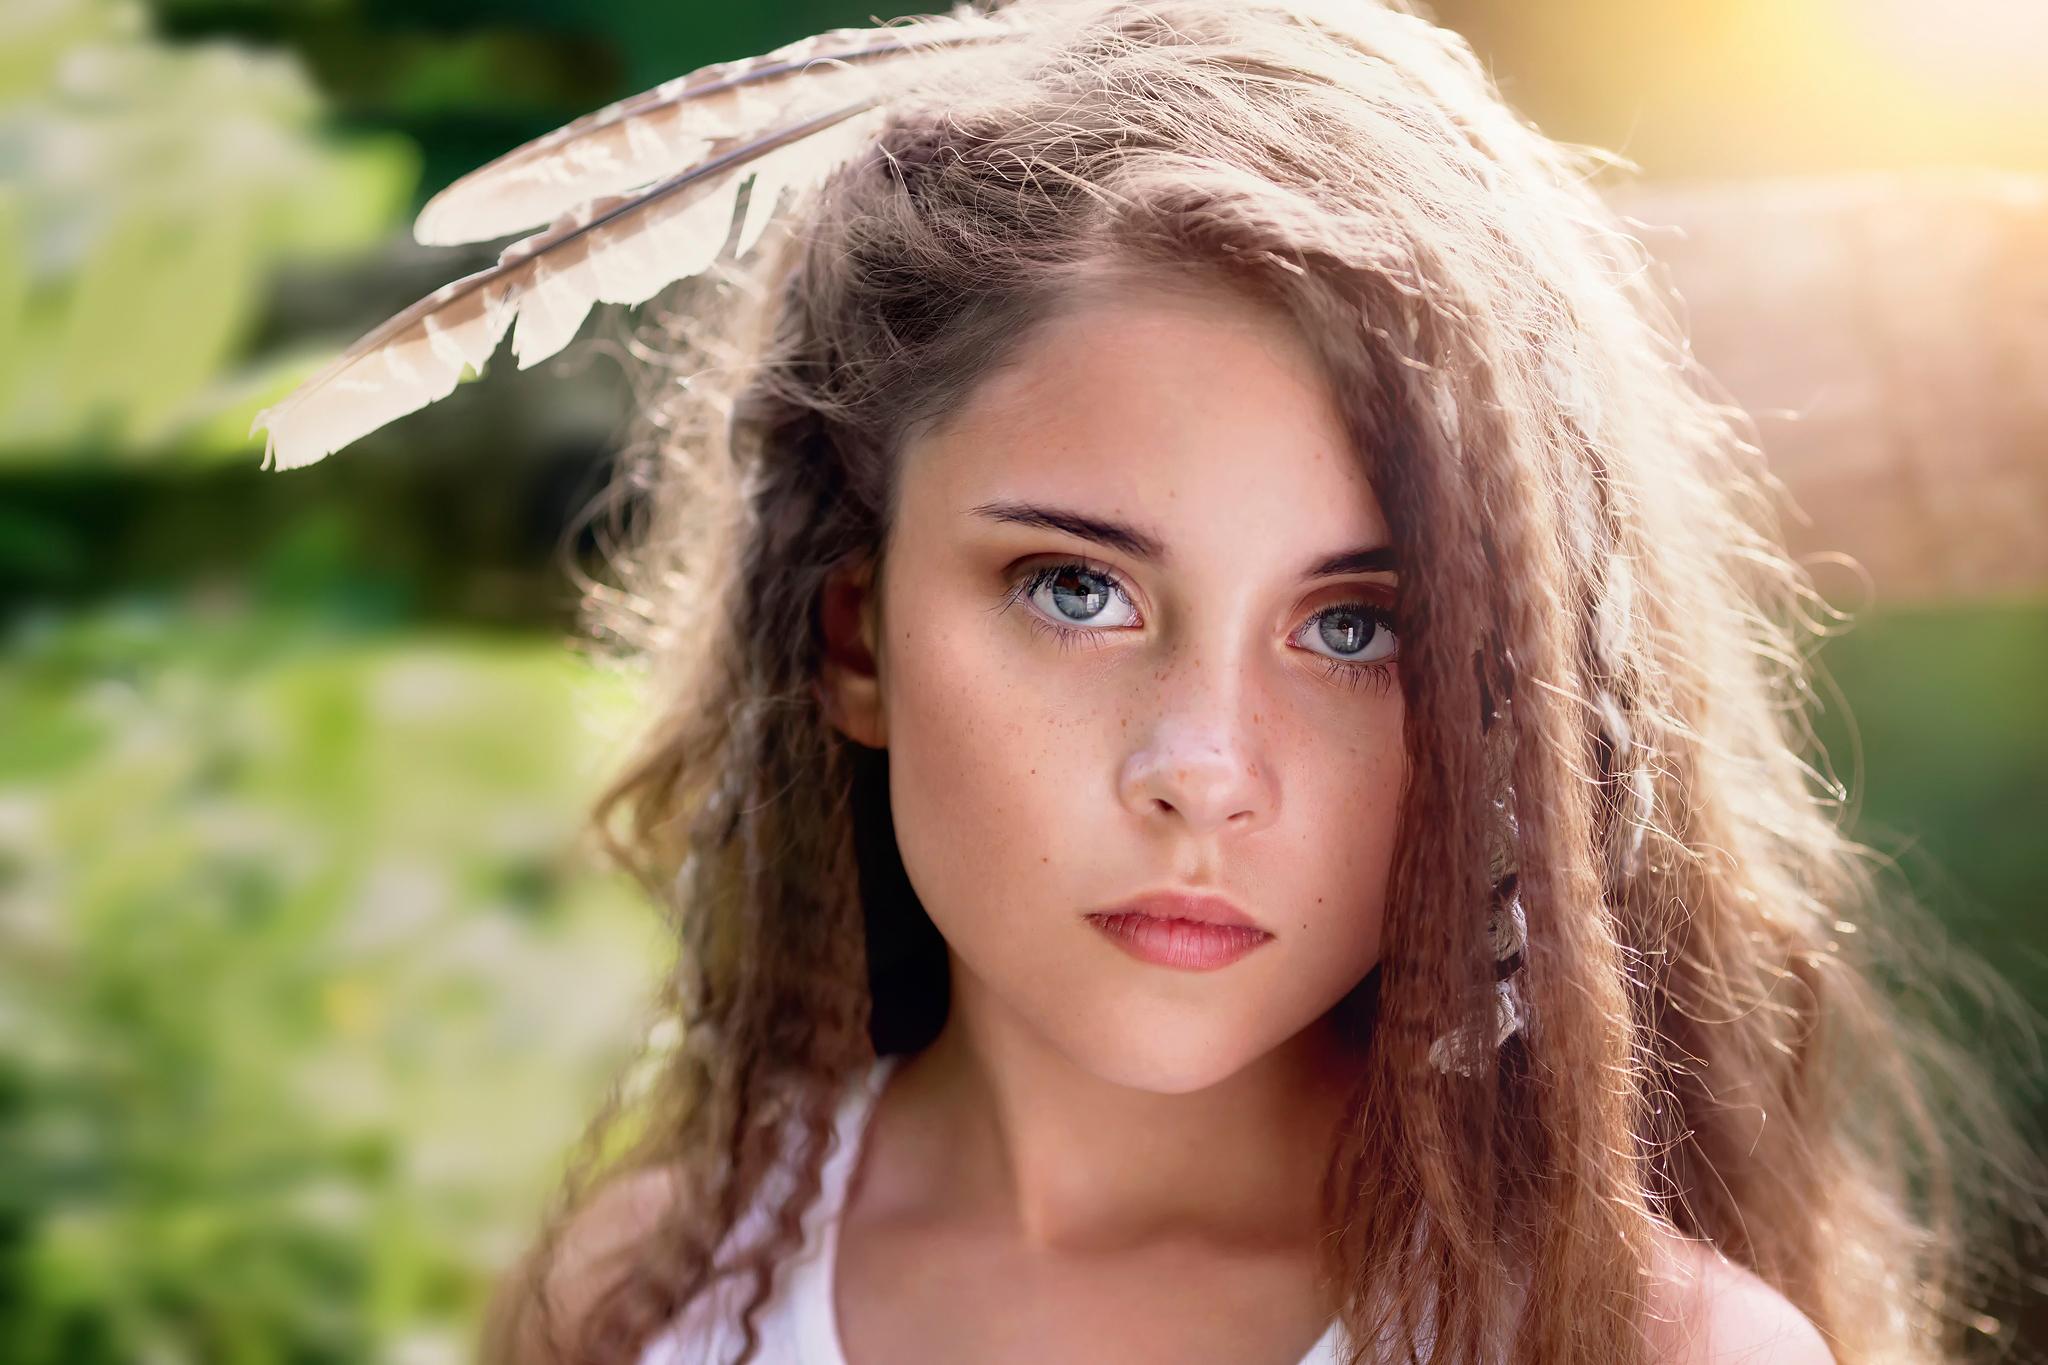 Подросток картинки девочка